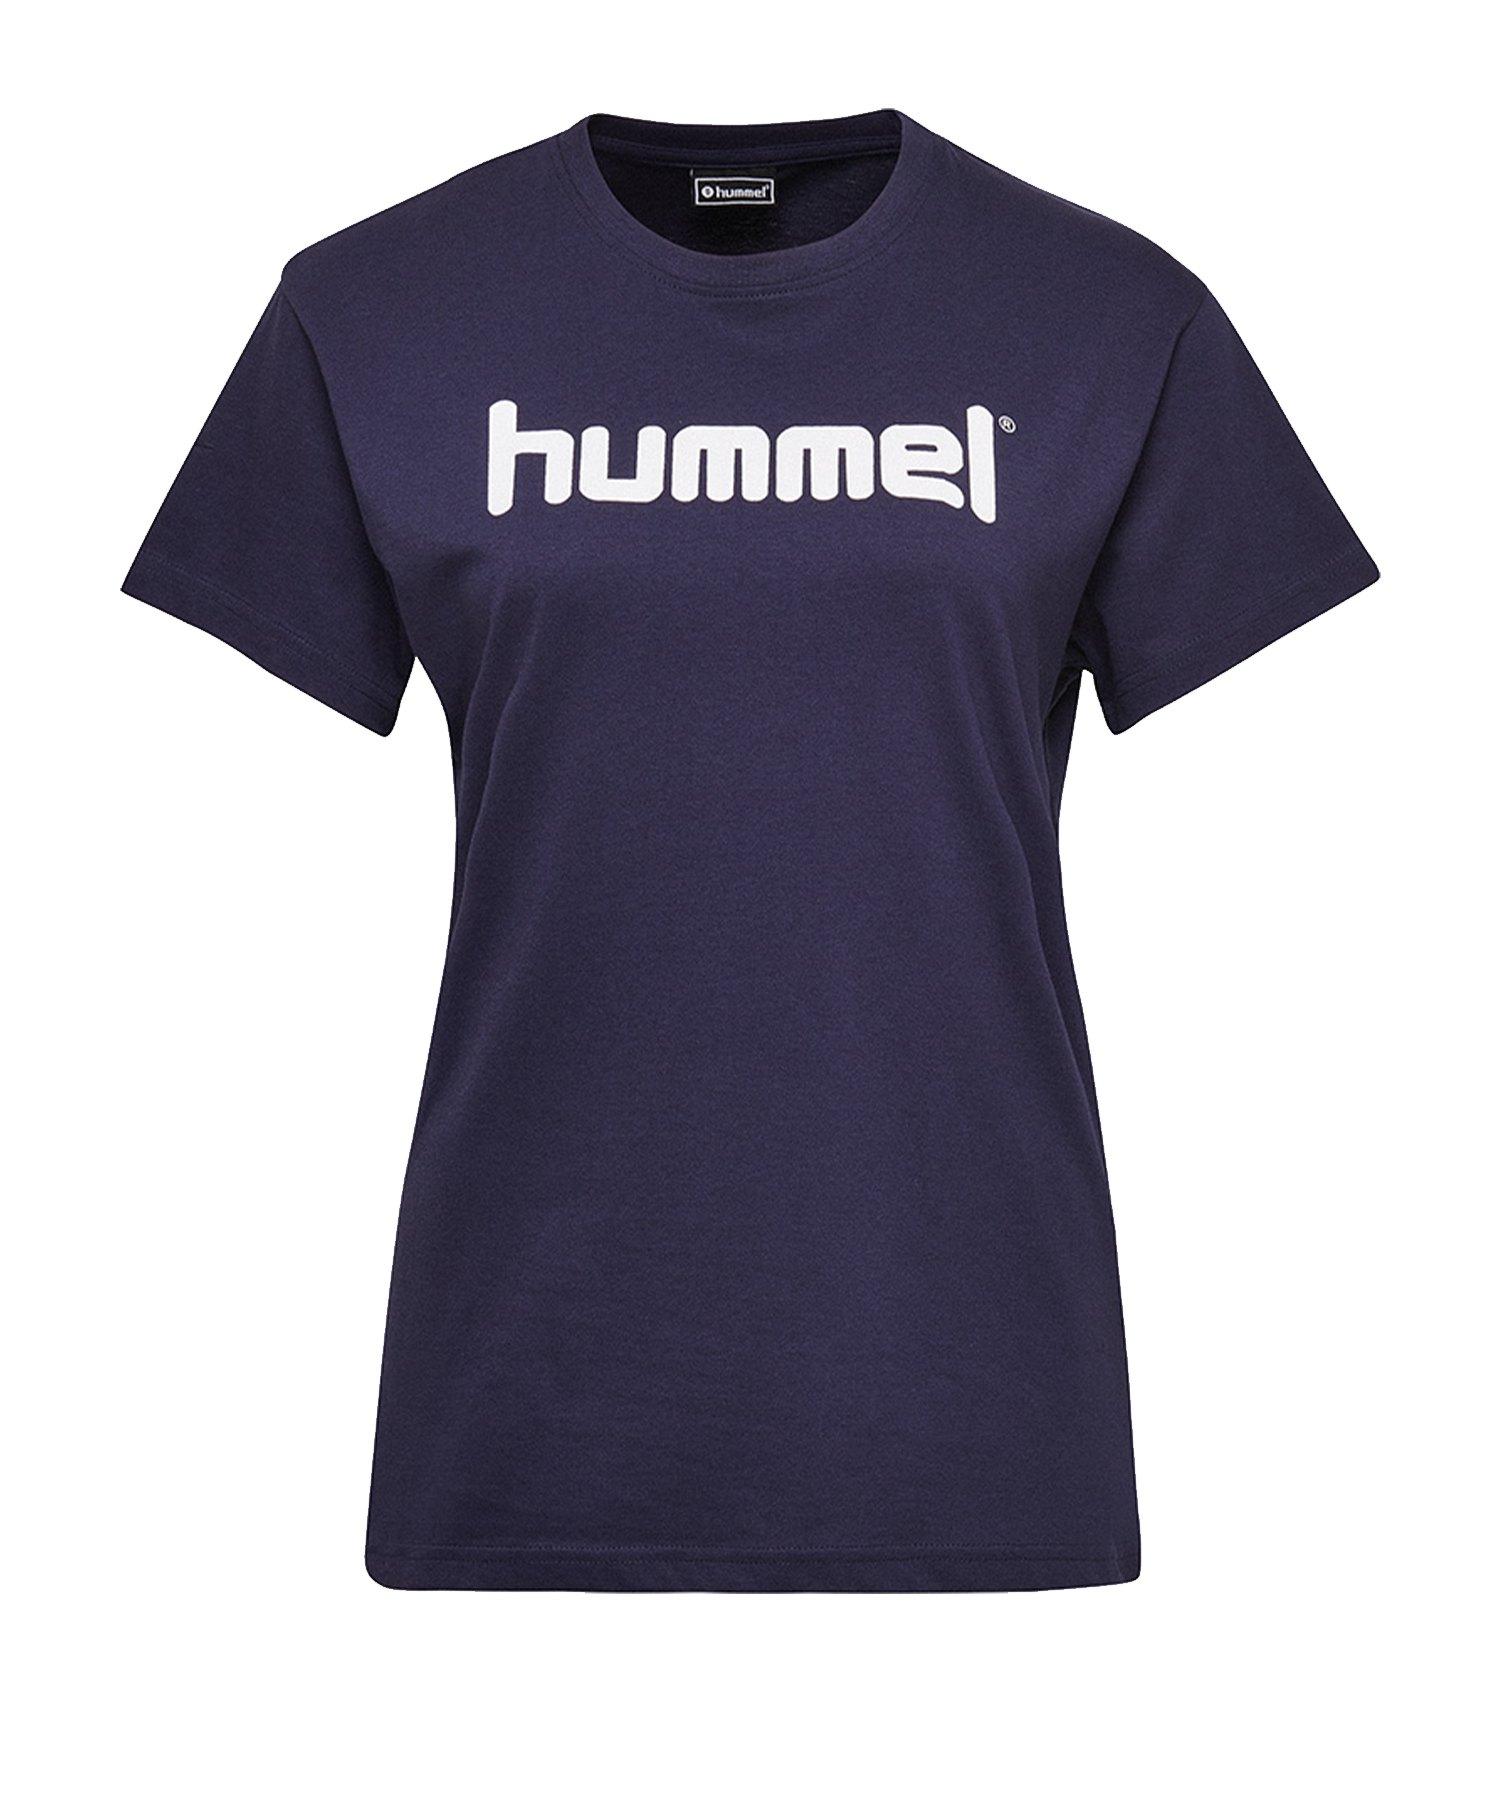 Hummel Cotton T-Shirt Logo Damen Blau F7026 - Blau